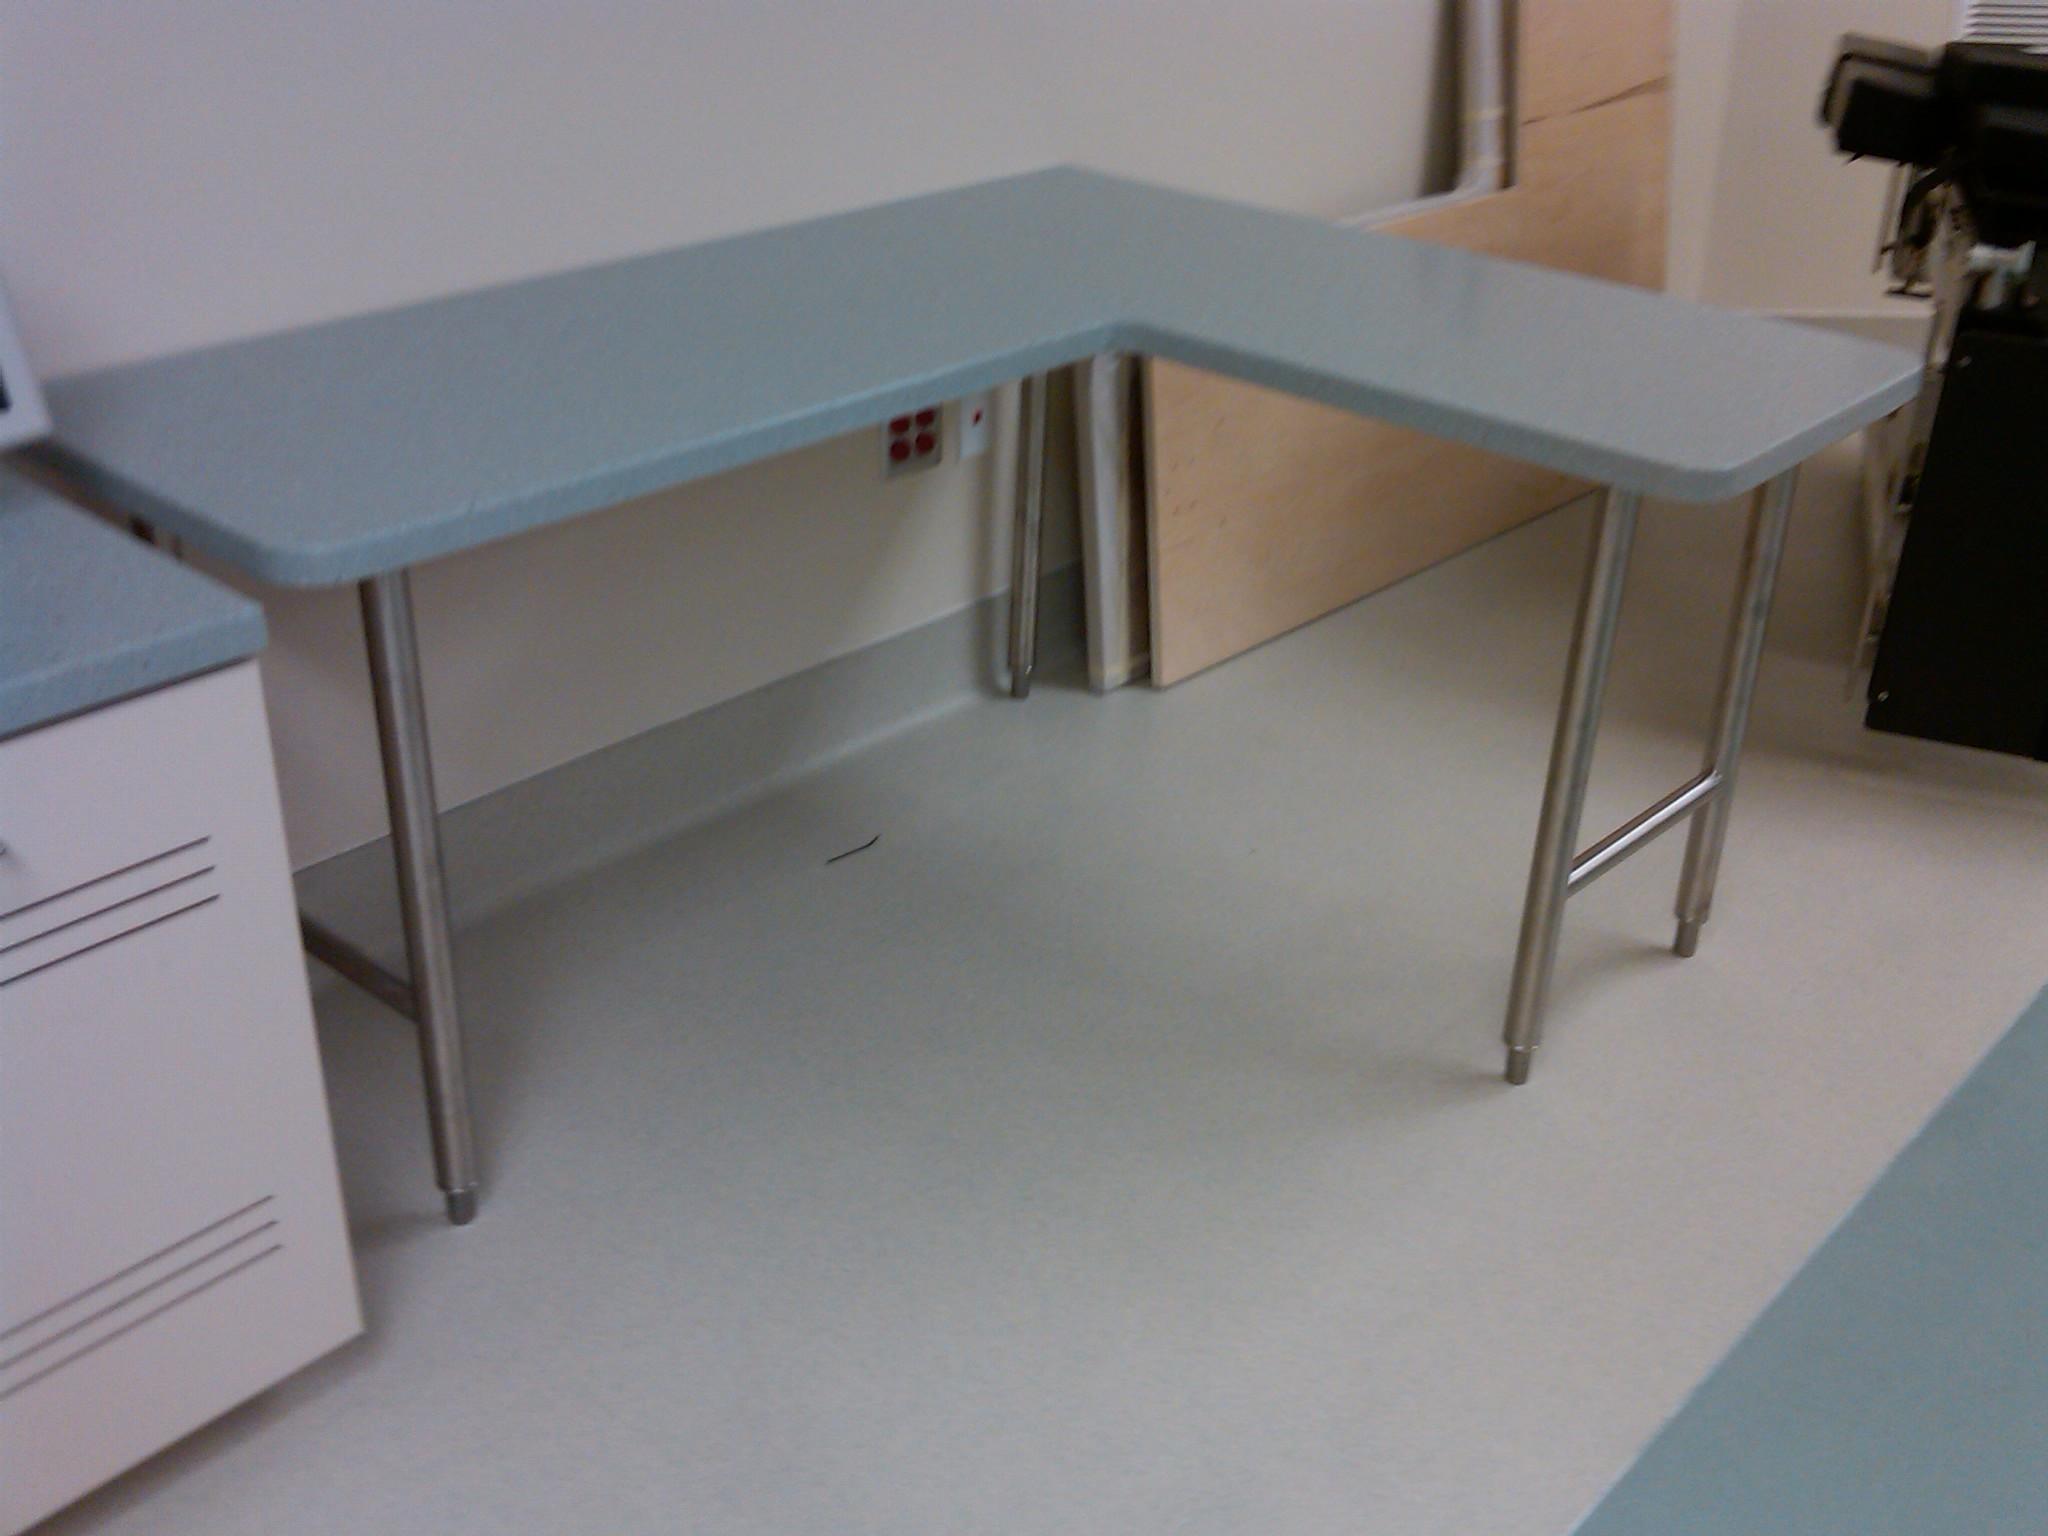 NYHQ desk.jpg